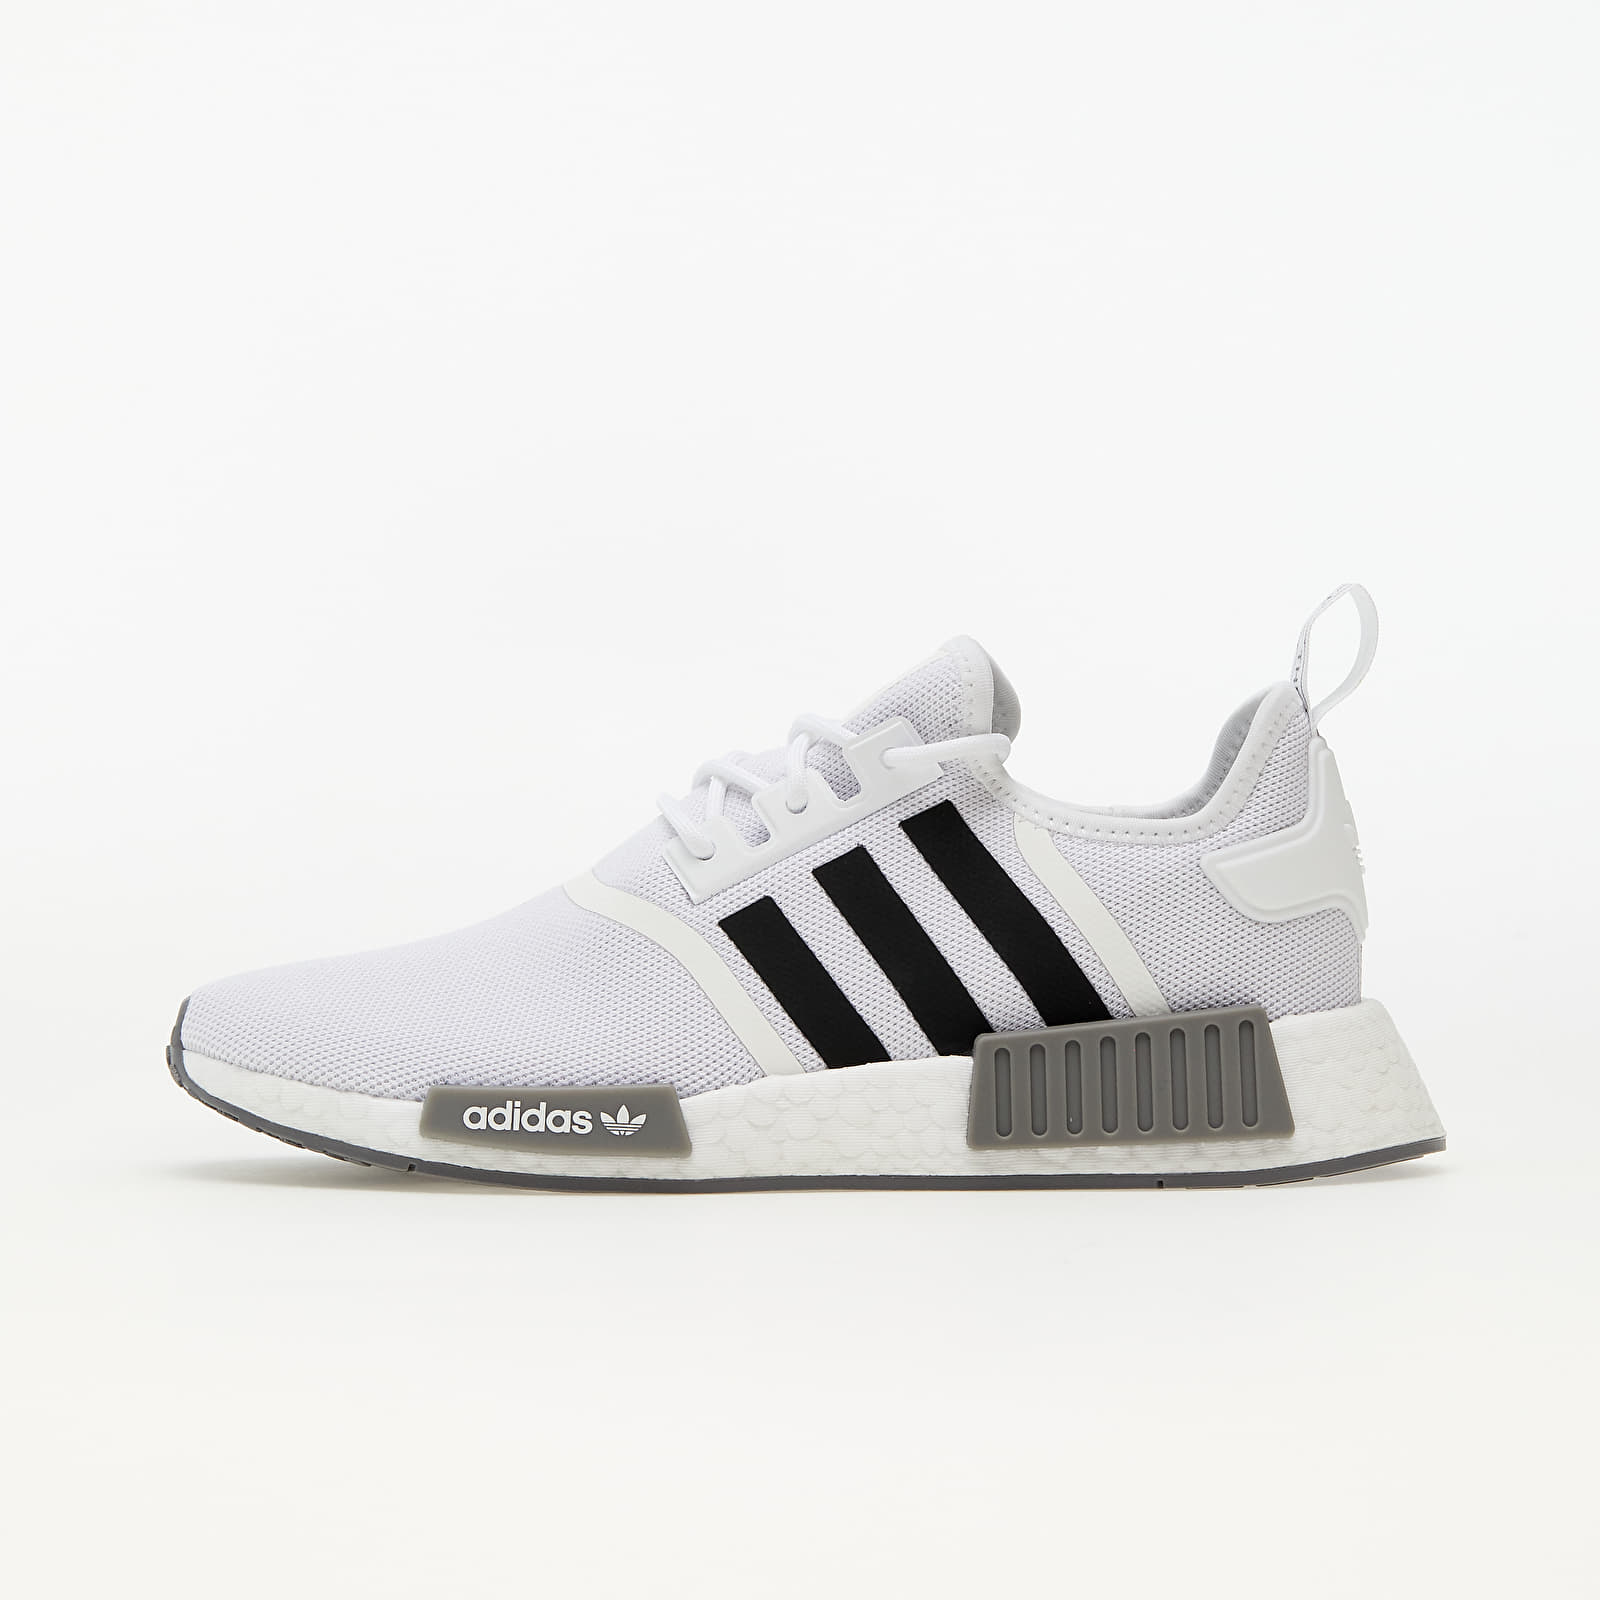 adidas NMD_R1 Primeblue Ftw White/ Core Black/ Grey Three EUR 40